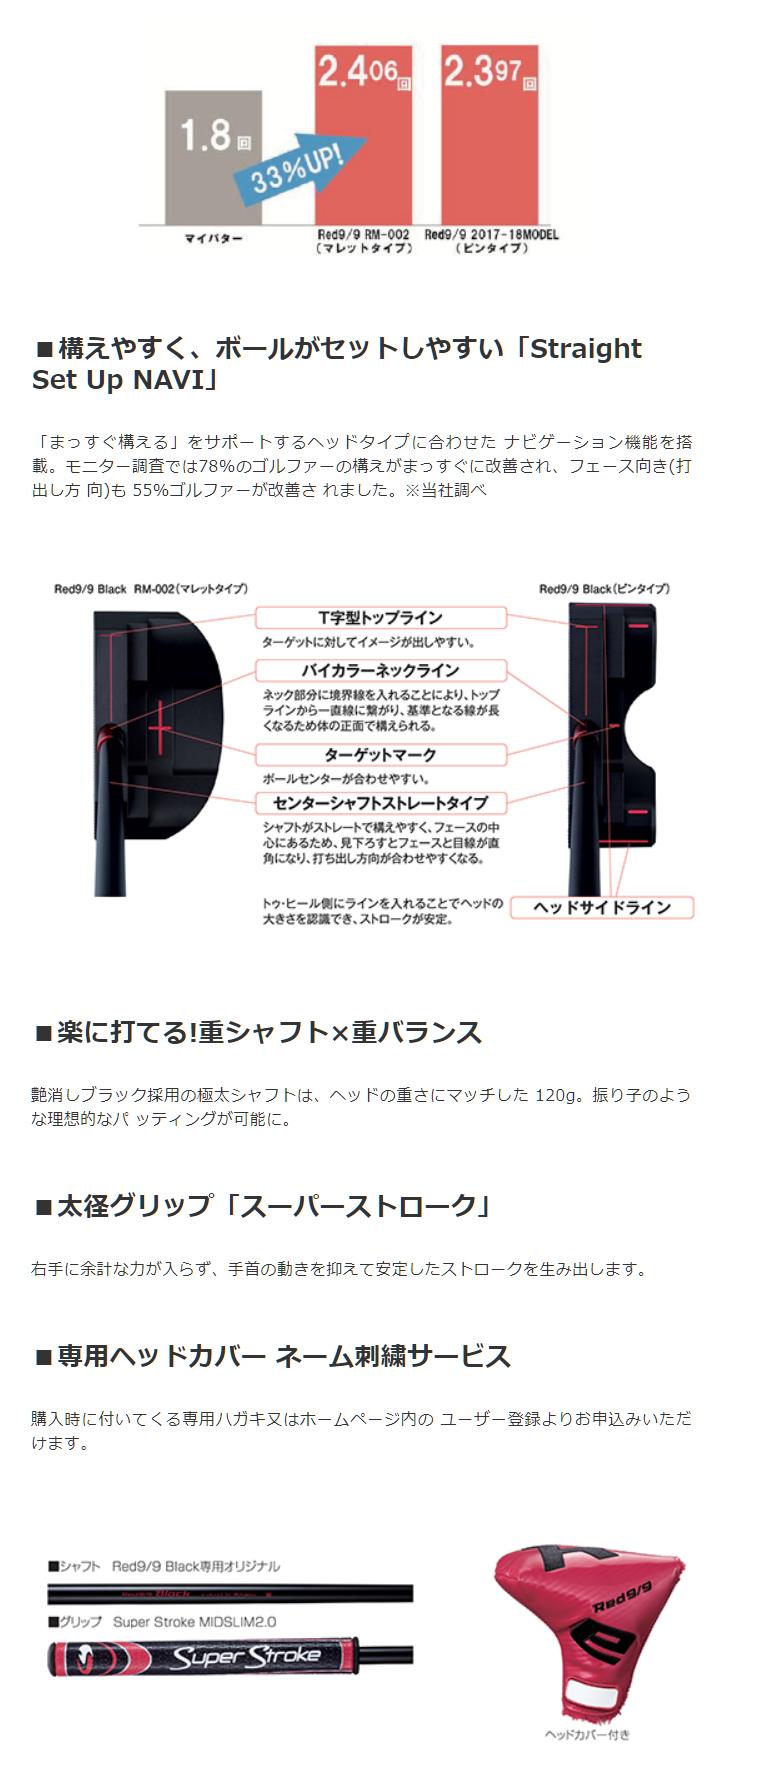 Red9/9 Black_2